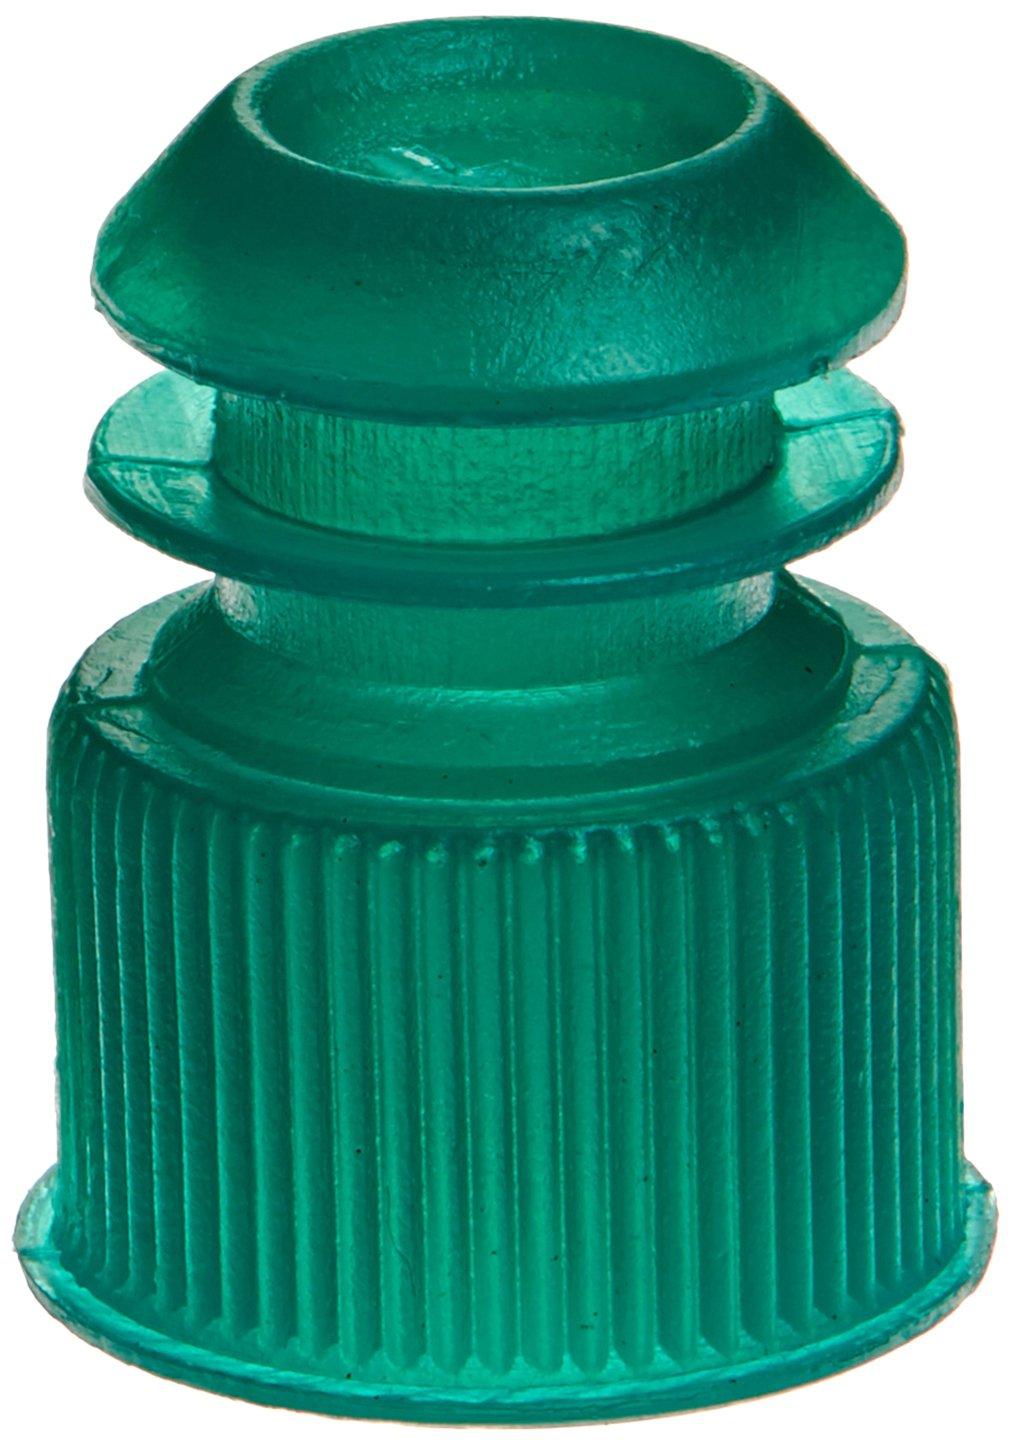 Globe Scientific 118240G Polyethylene Flange Plug Cap for Test Tubes, 13mm Size, Green (Pack of 1000)